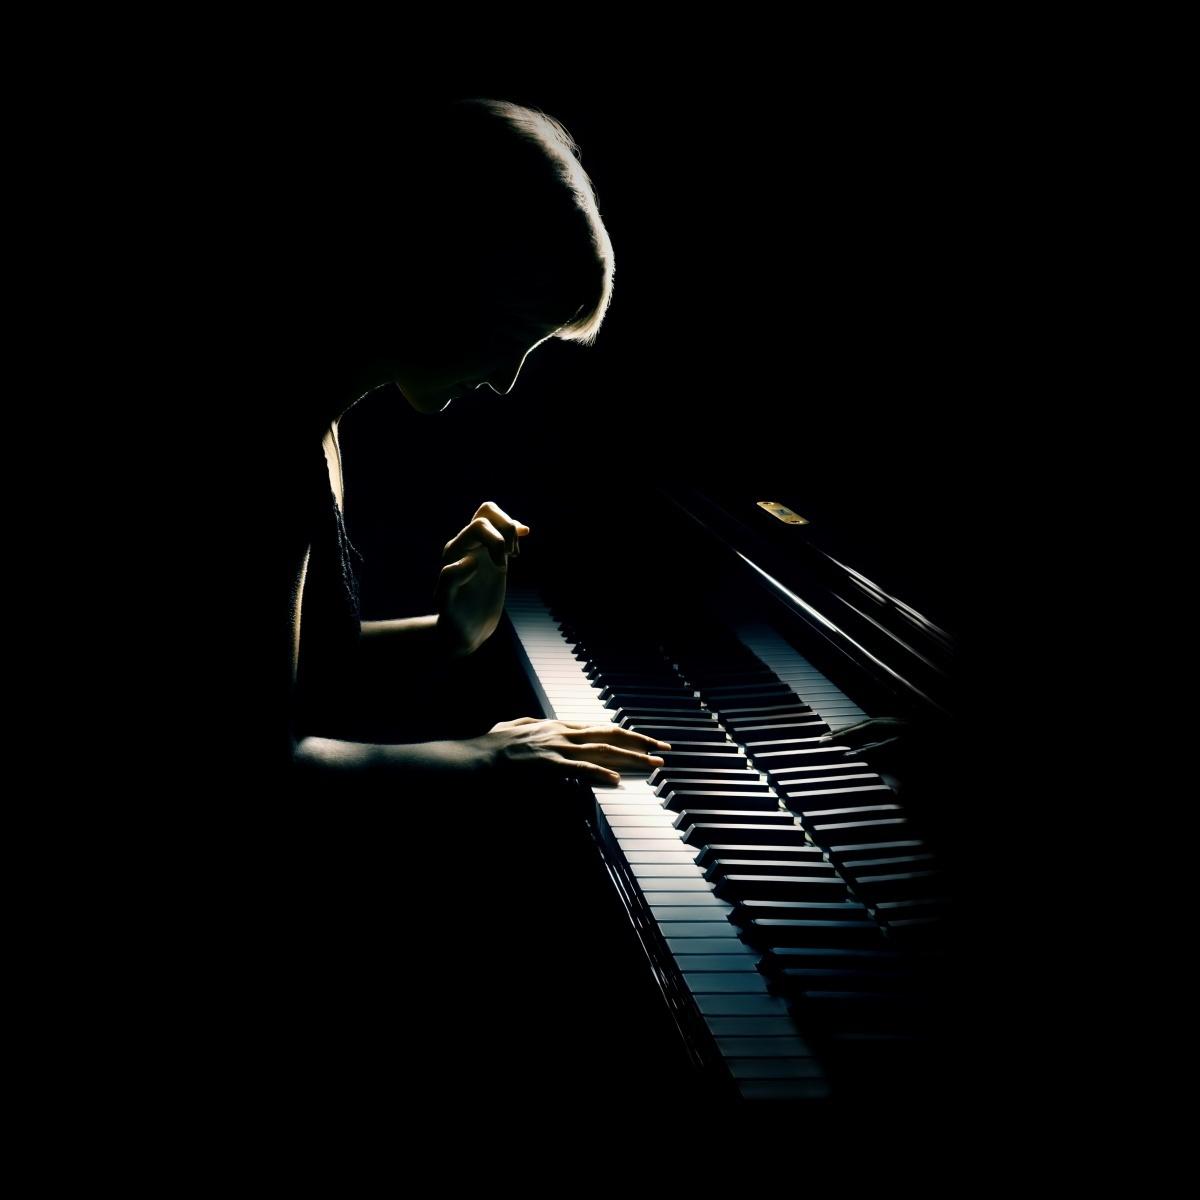 М�ж�ина за �о��епиано � man at the piano